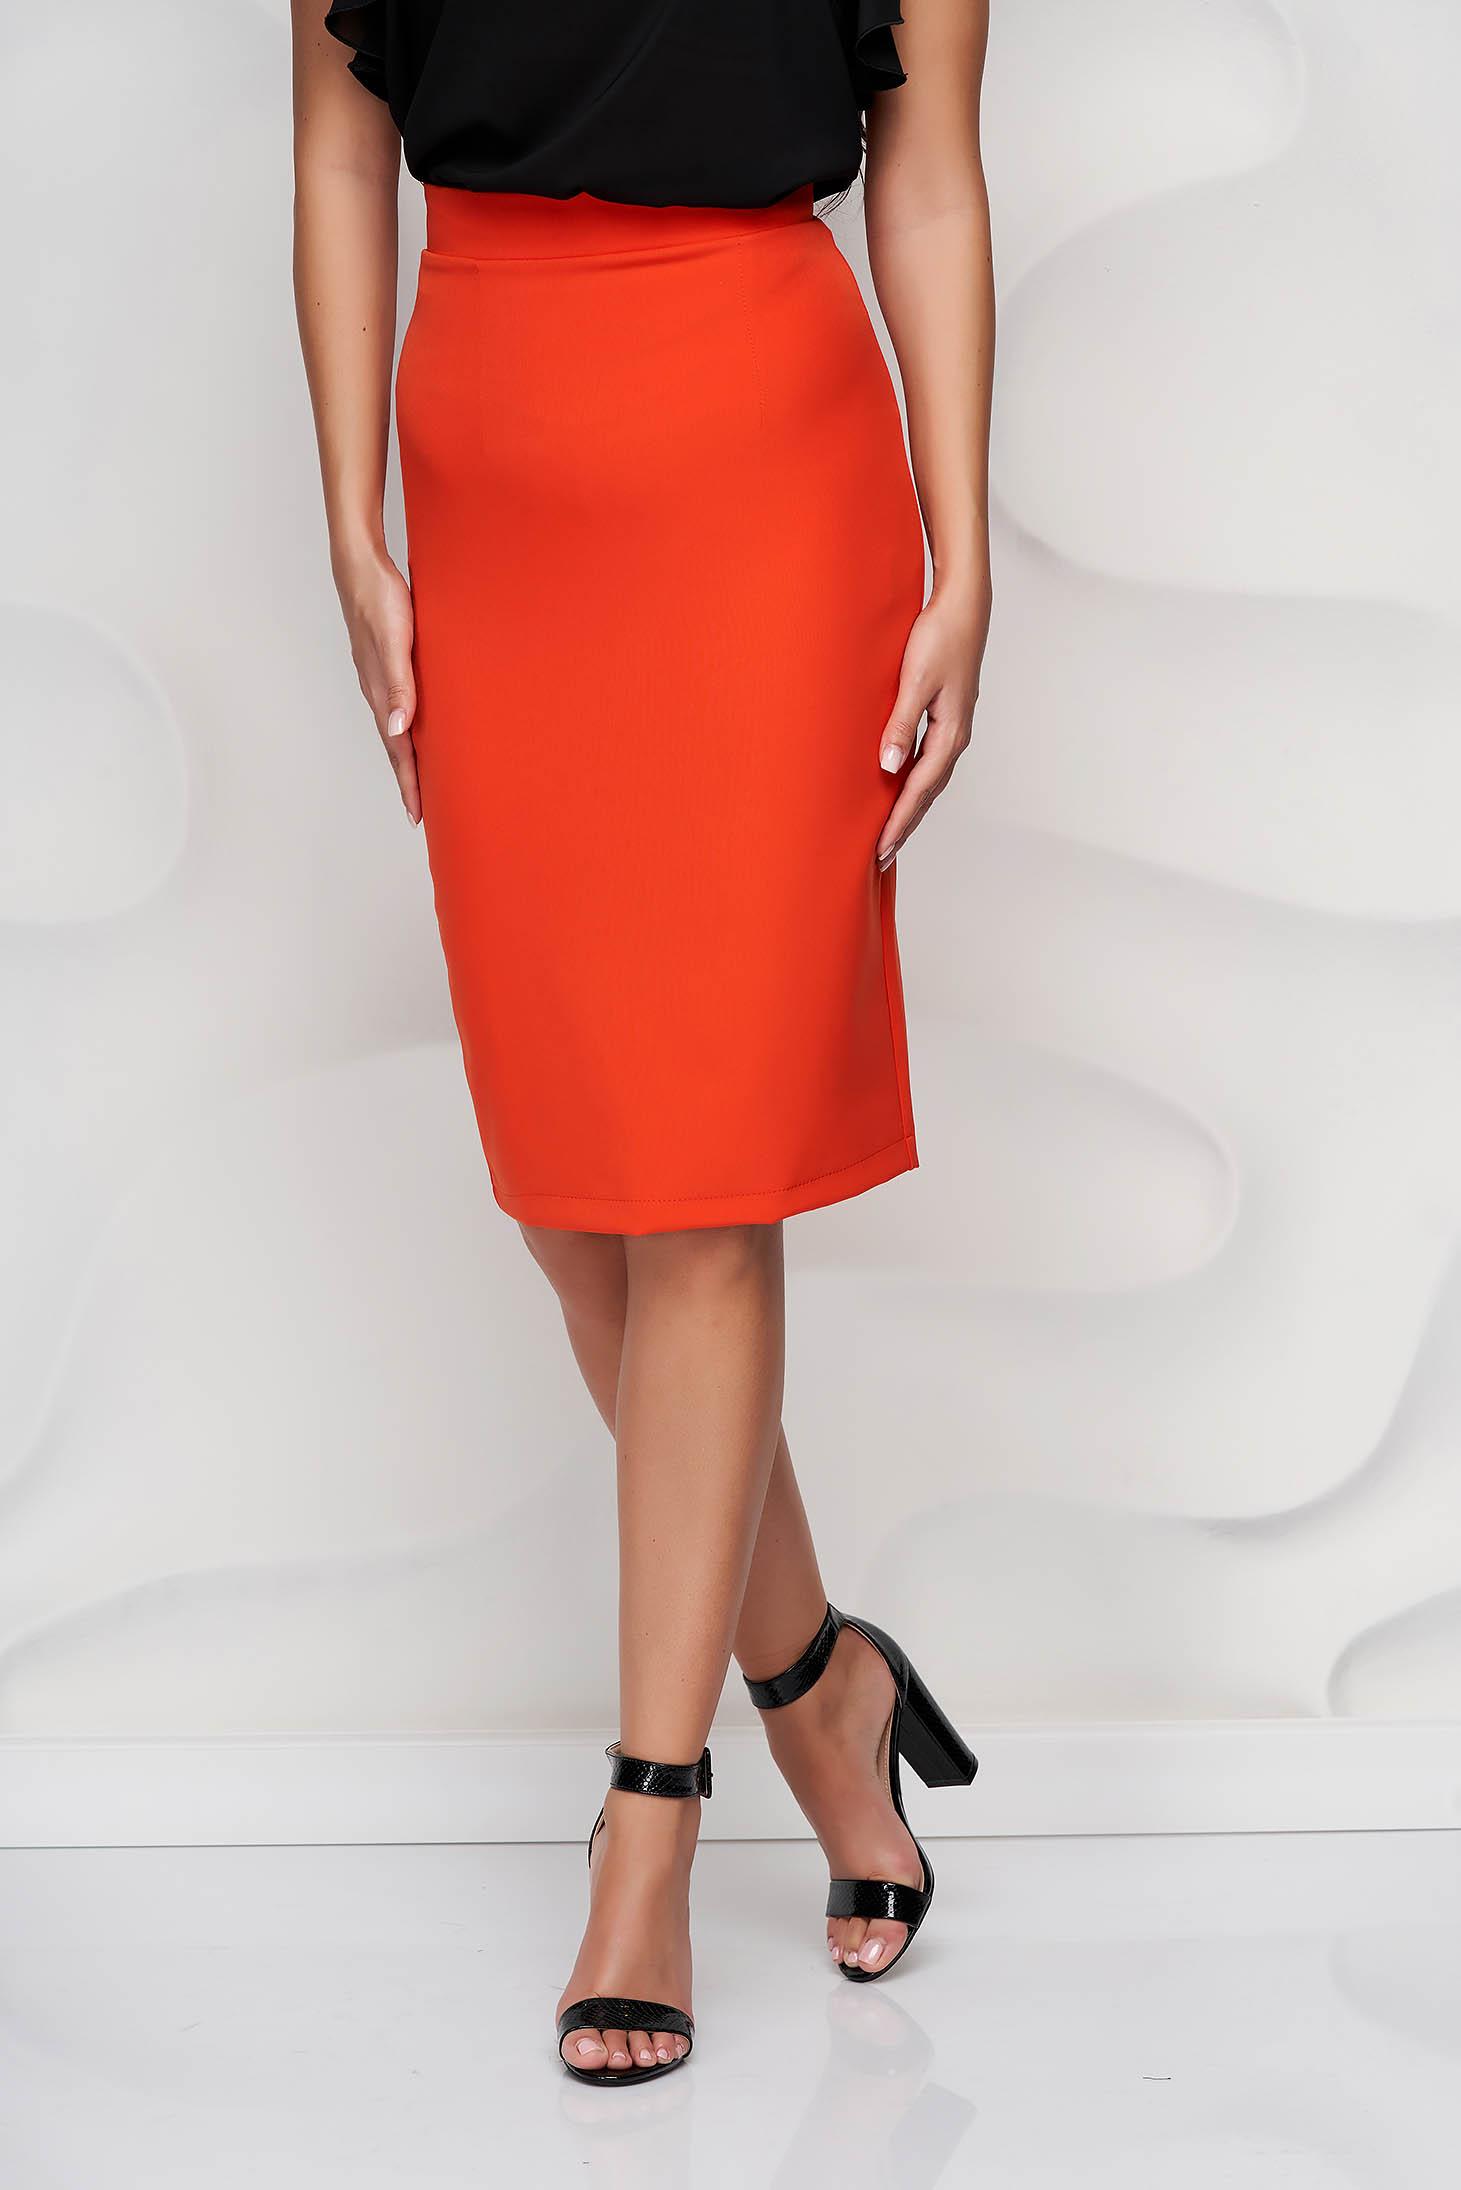 StarShinerS orange high waisted skirt office pencil cloth midi from elastic fabric